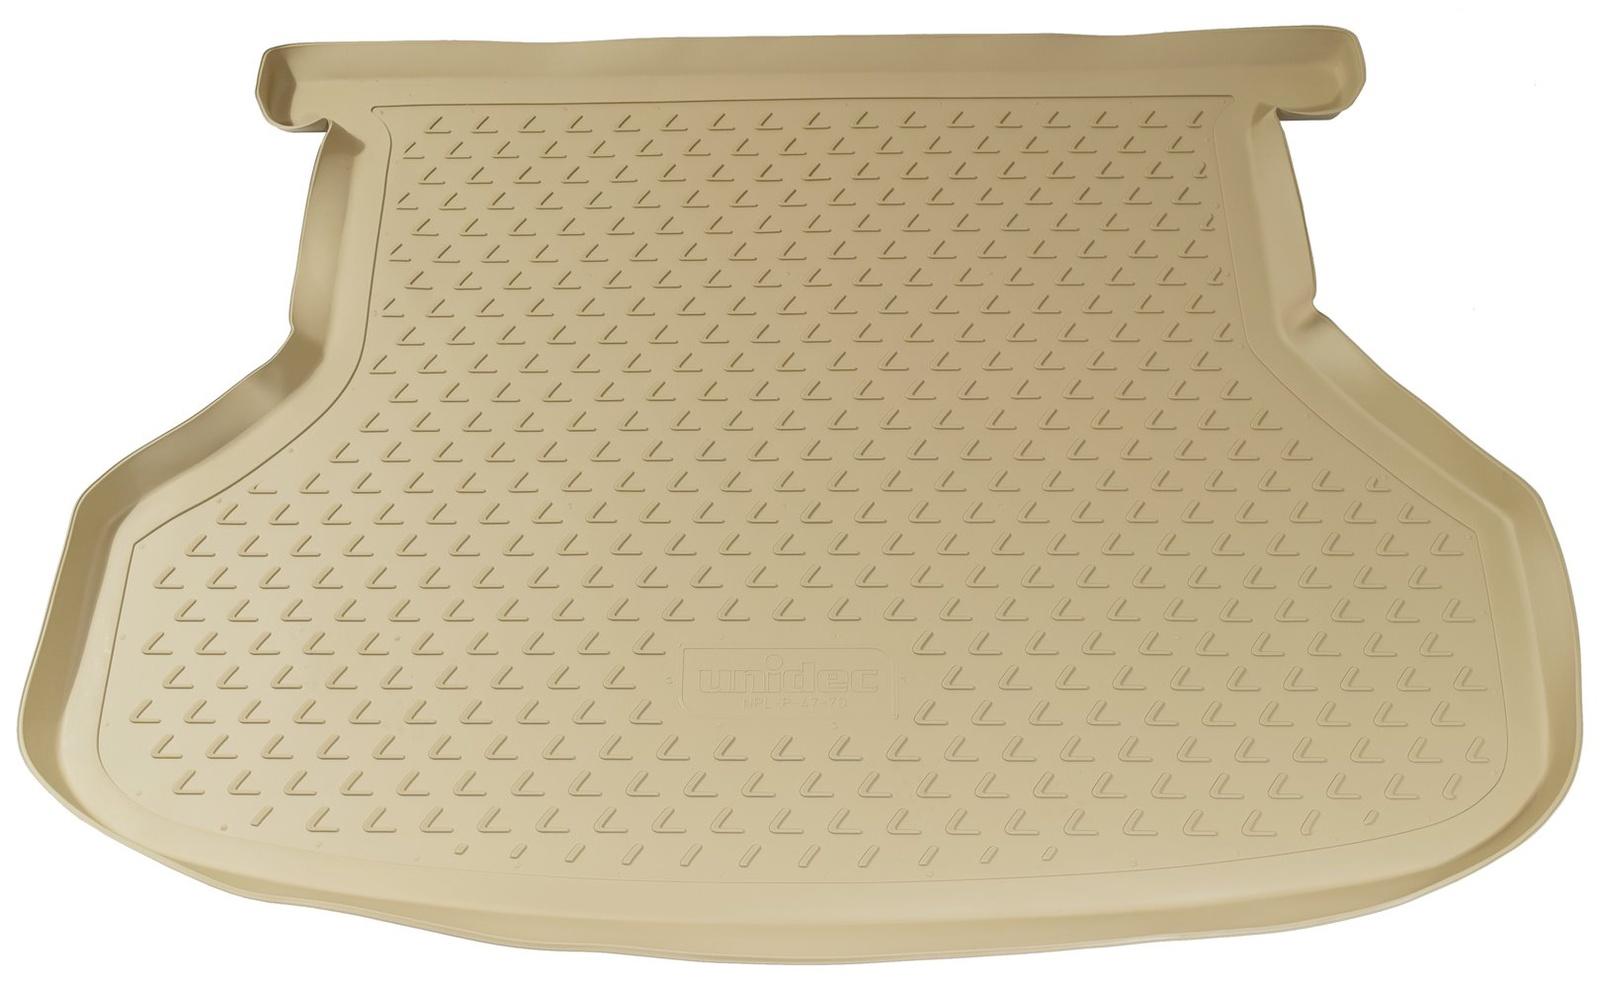 Коврик для багажника Norplast для mazda 6, hb, 2002-2007, npl-p-55-07-b, бежевый коврик багажника полиуретан чёрный 2awd norplast npl p 69 04 для renault duster 2011